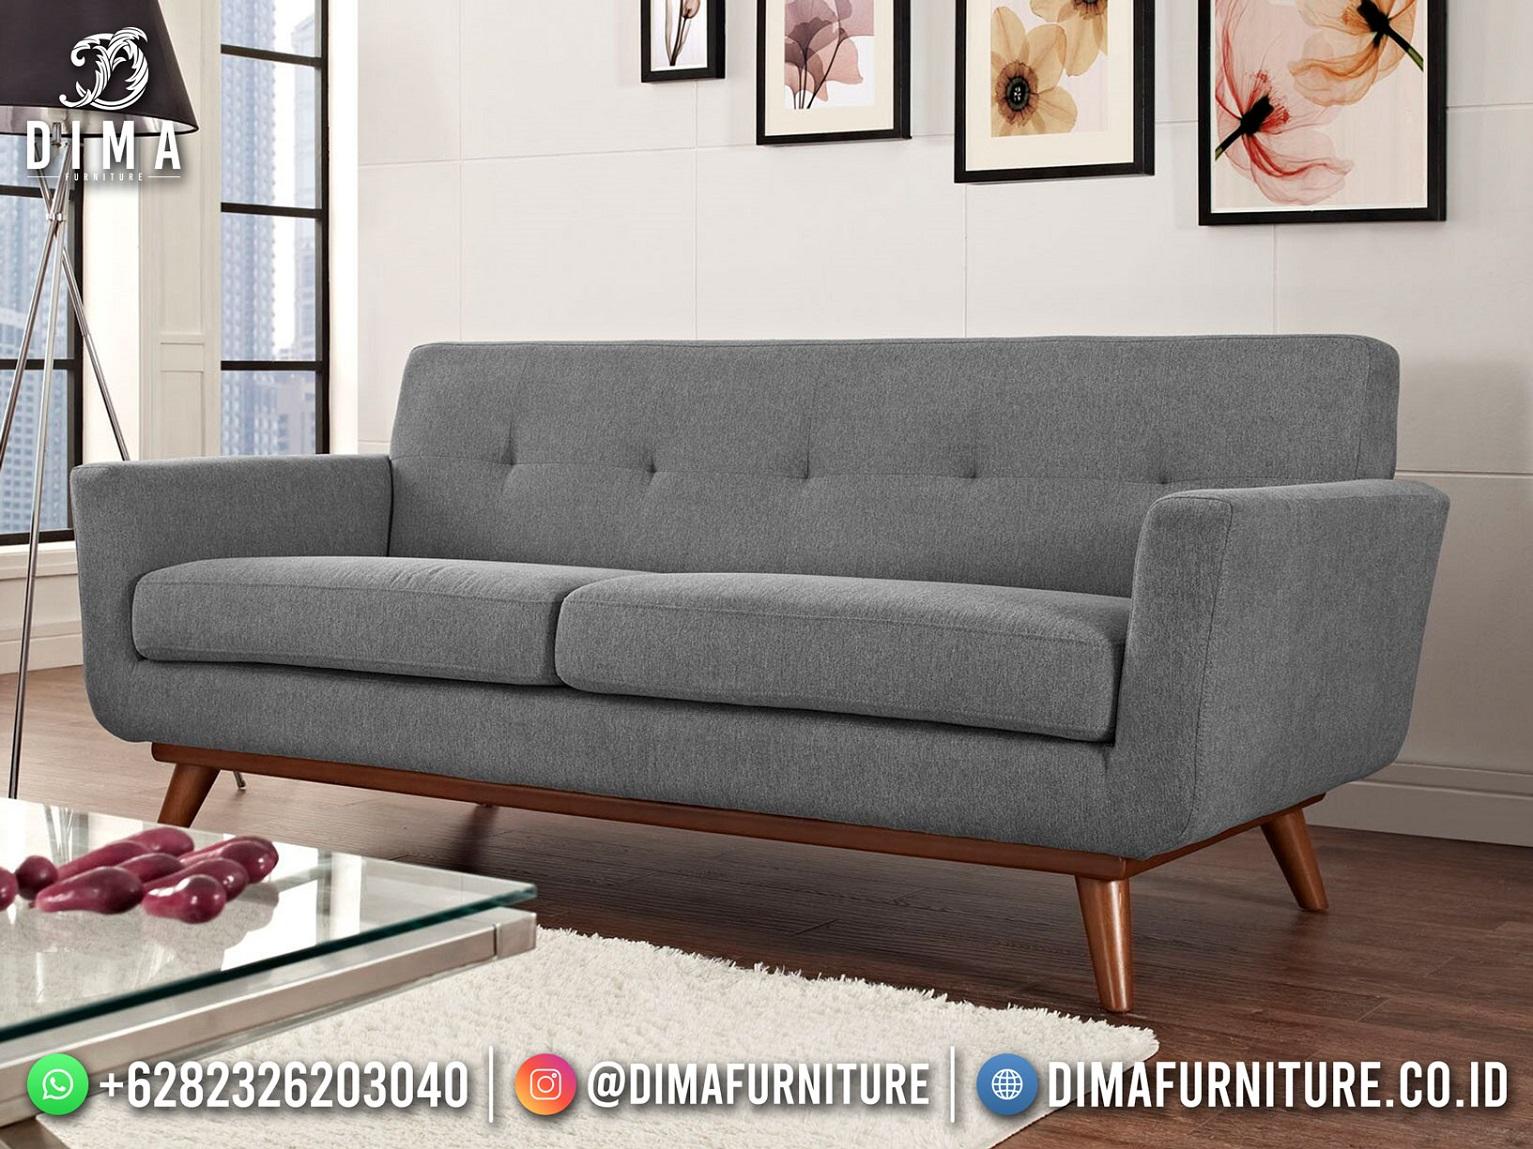 Desain Sofa Minimalis Jepara Beauty Soft Grey ST-1582